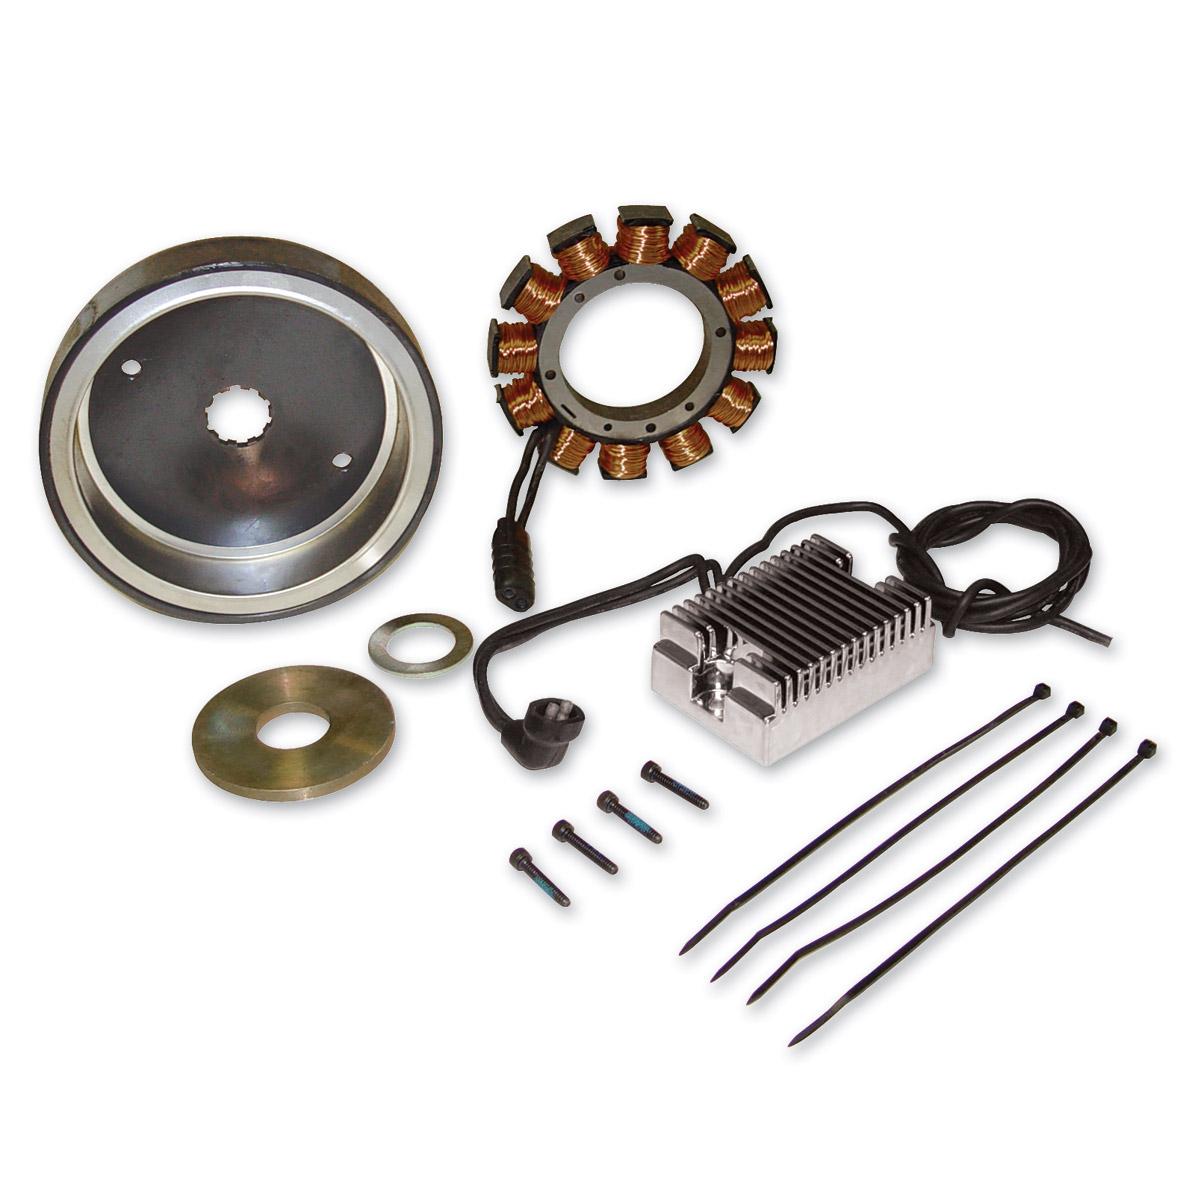 Mid-USA 32-Amp Charging Kit